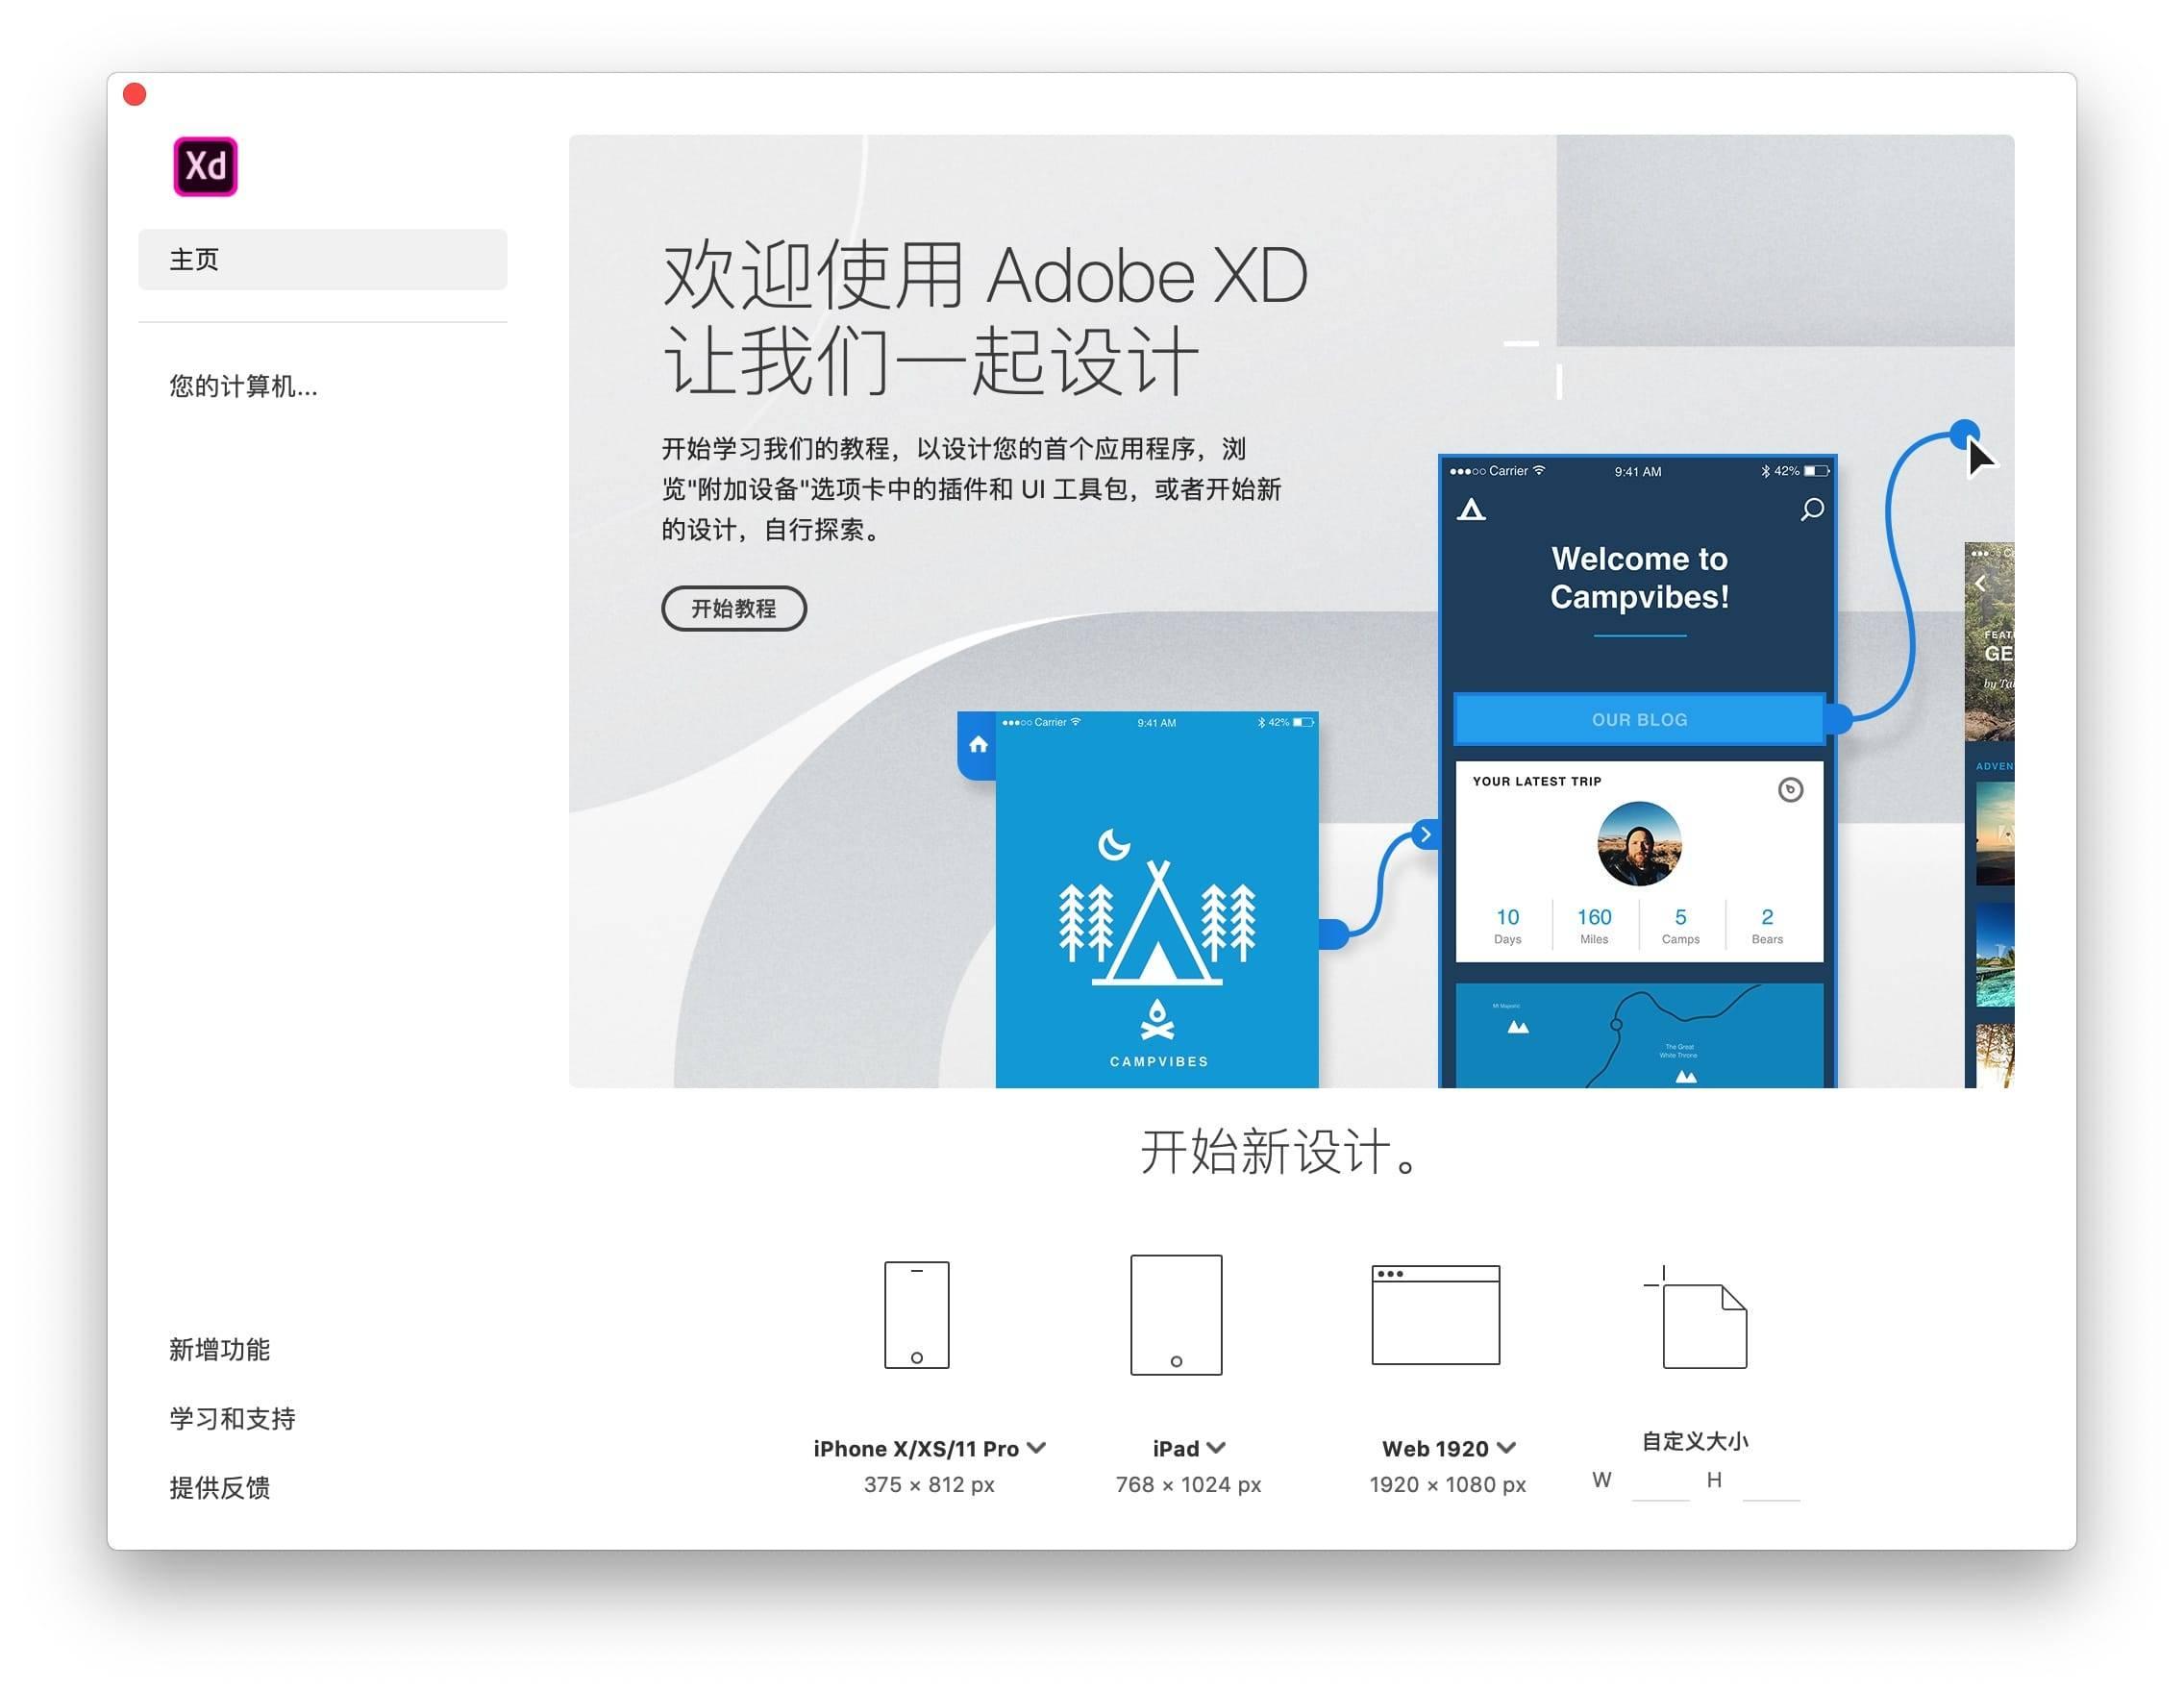 Adobe XD 28.3.12 中文免激活版 界面设计和原型交互工具 Adobe系列 第2张